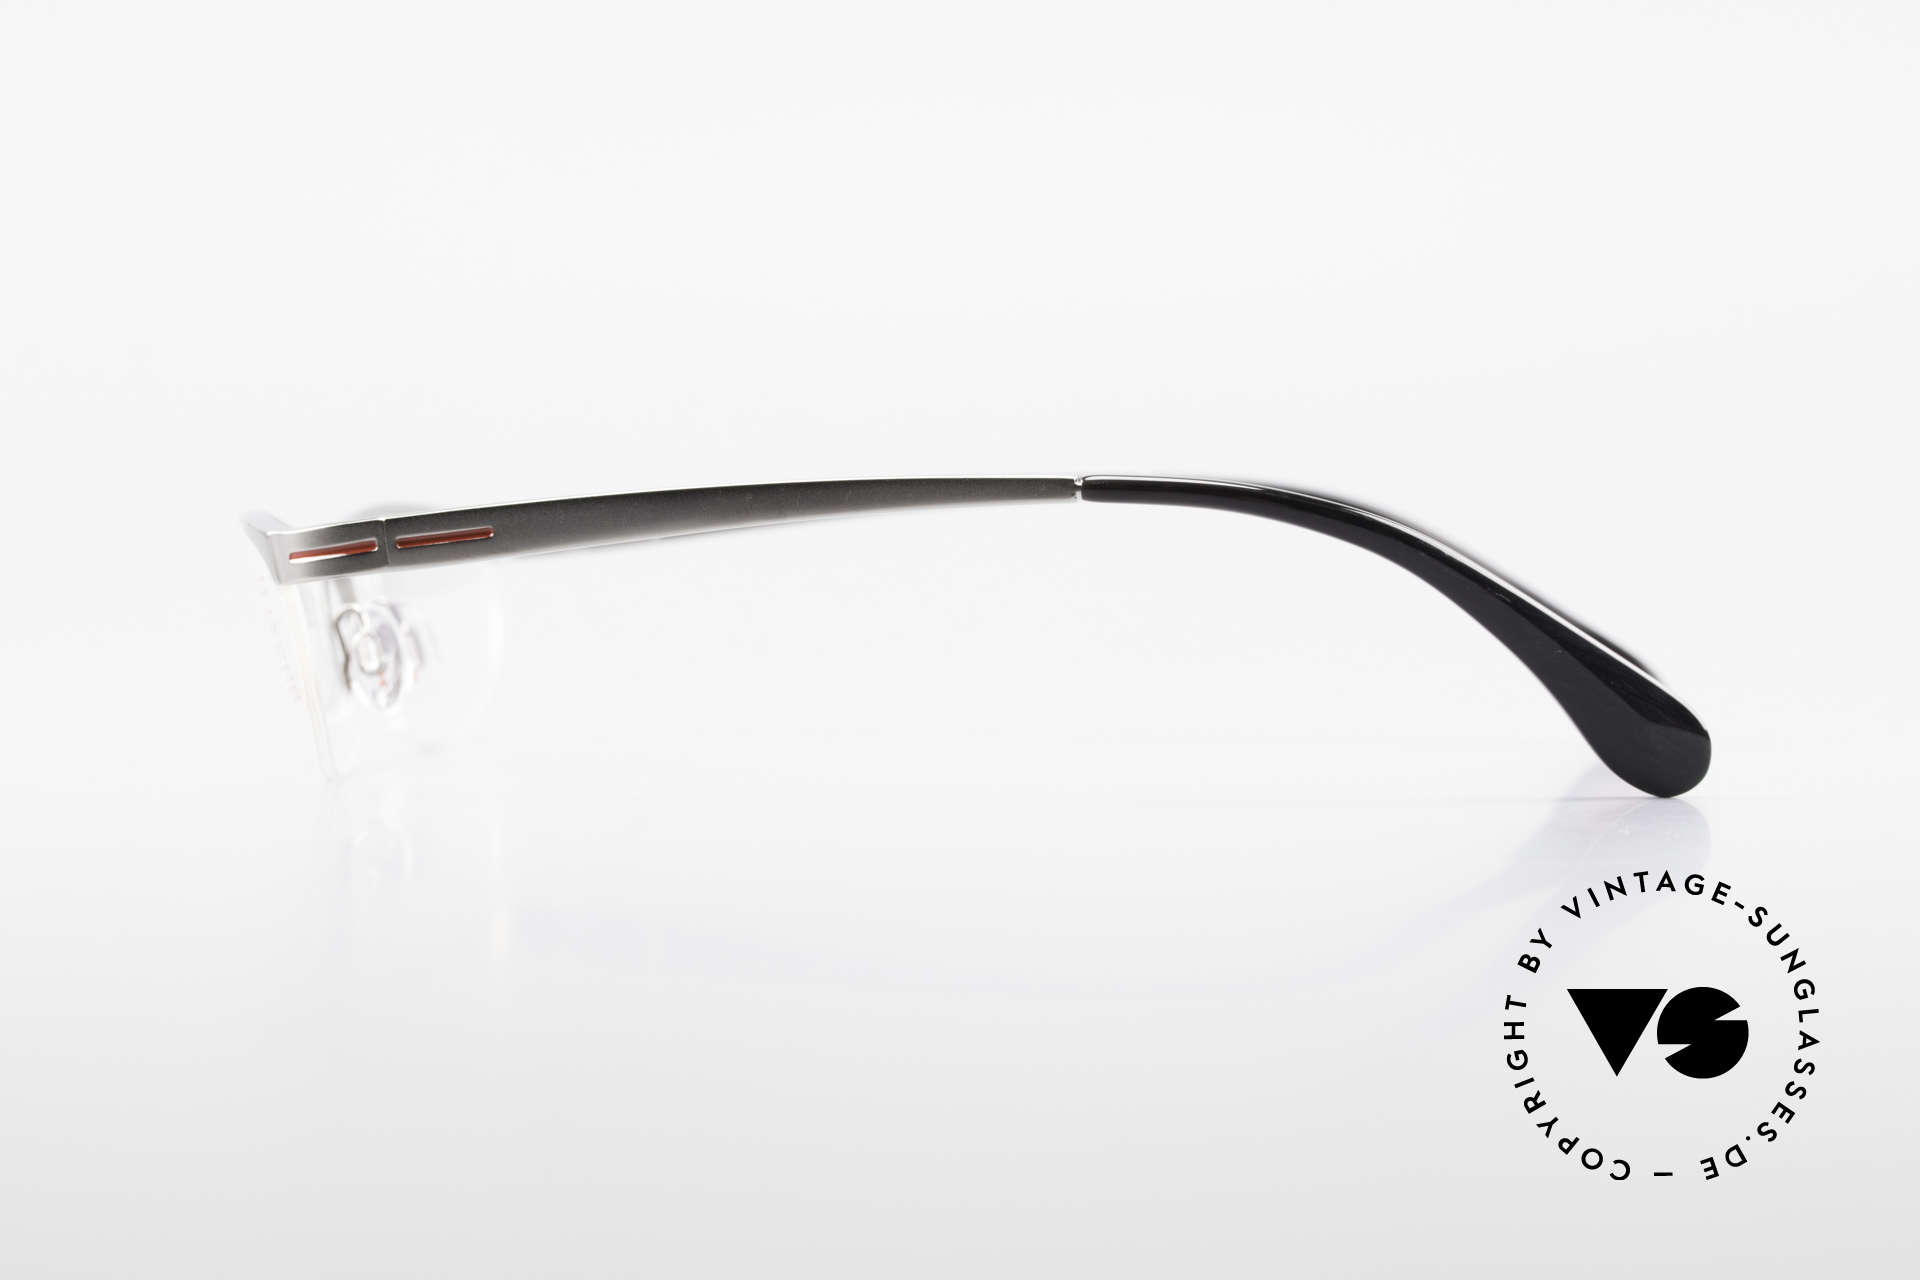 Bugatti 497 Ruthenium Vintage Eyeglasses, satin-ruthenium finish = pure luxury glasses, Made for Men